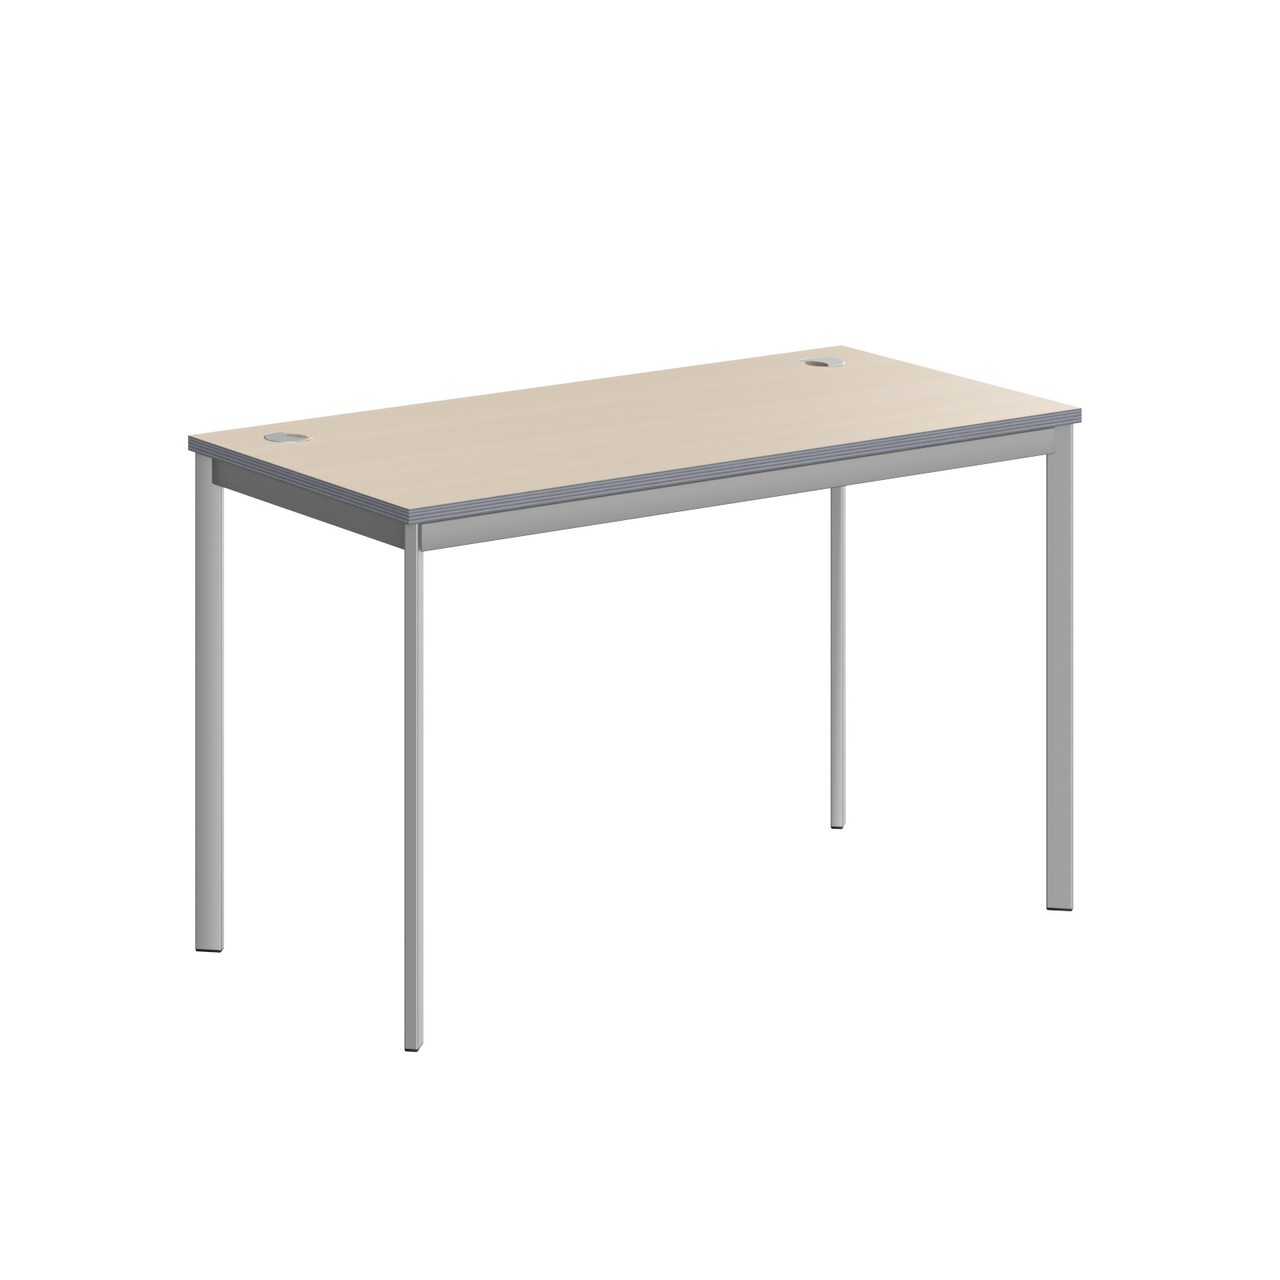 Стол прямой  IMAGO-S 120x60x76 - фото 5